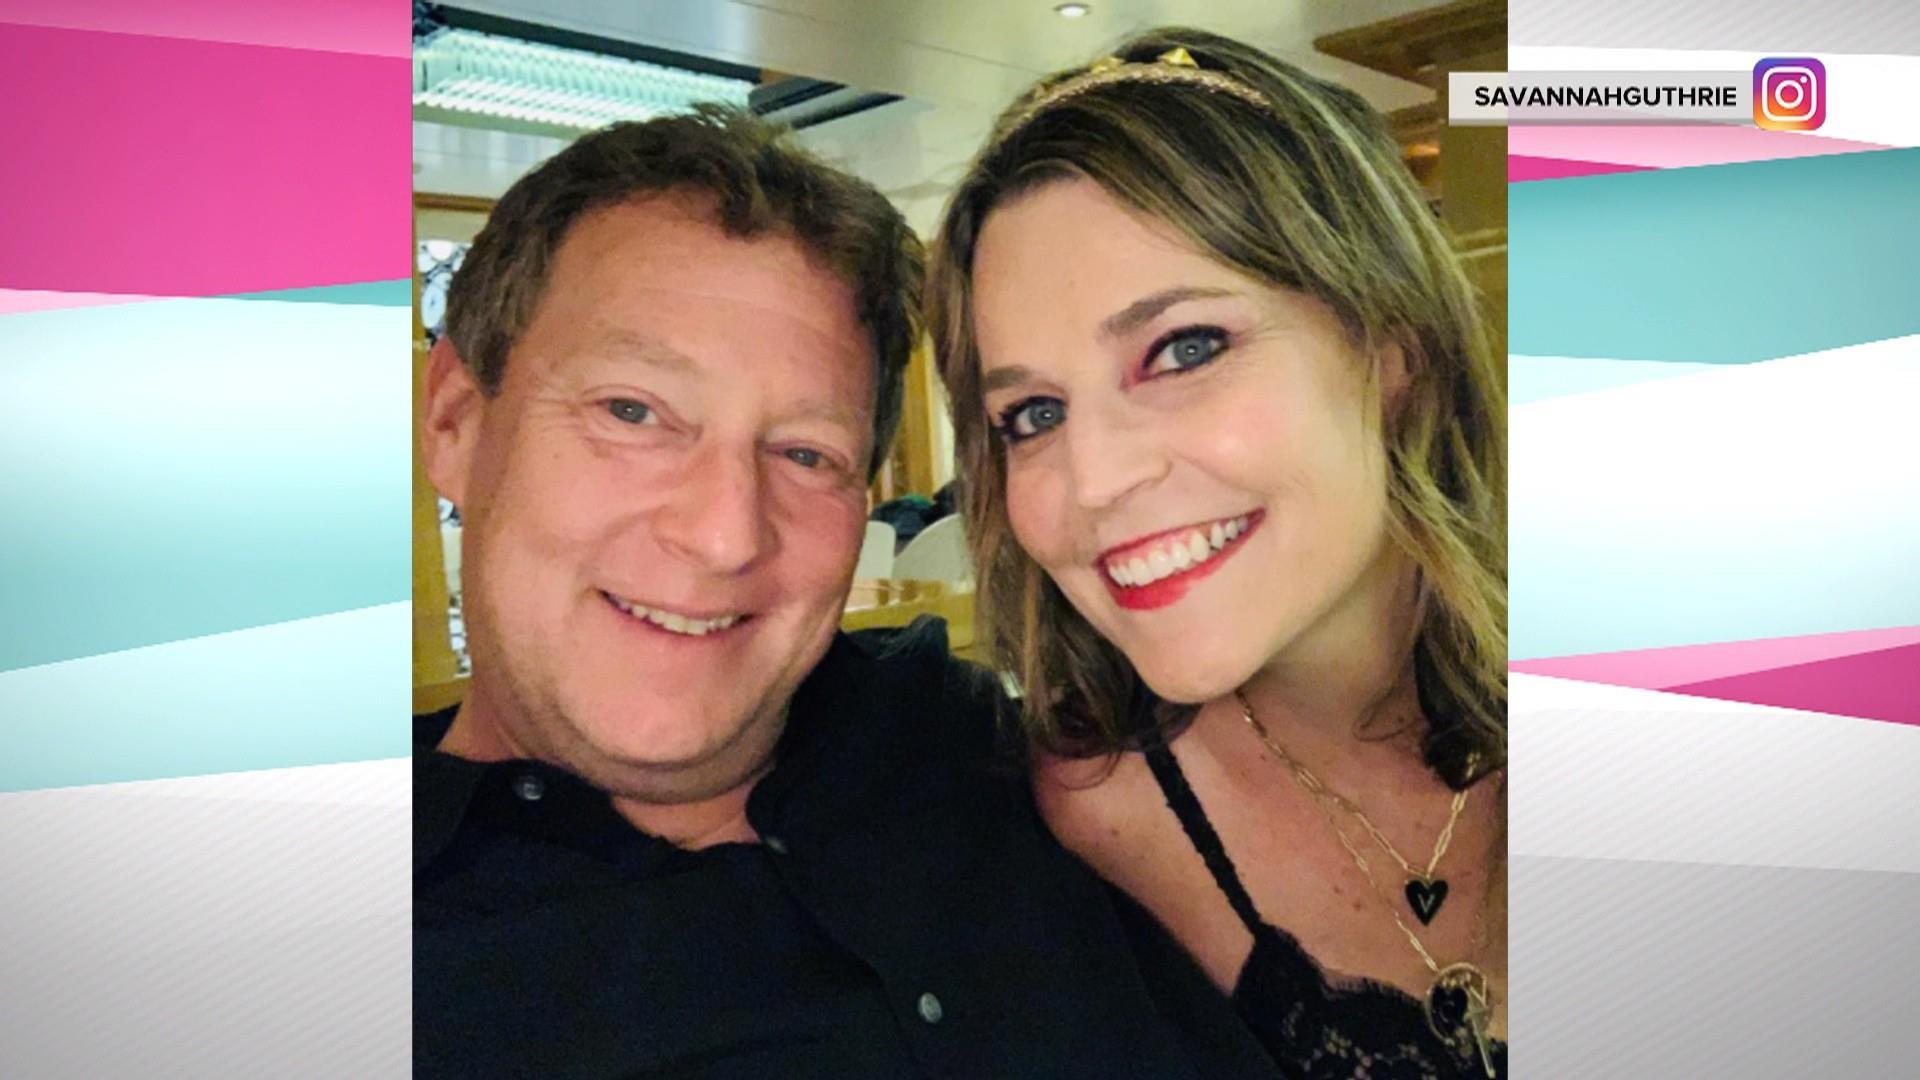 Savannah Guthrie Tells Her Engagement Story To Jenna Bush Hager